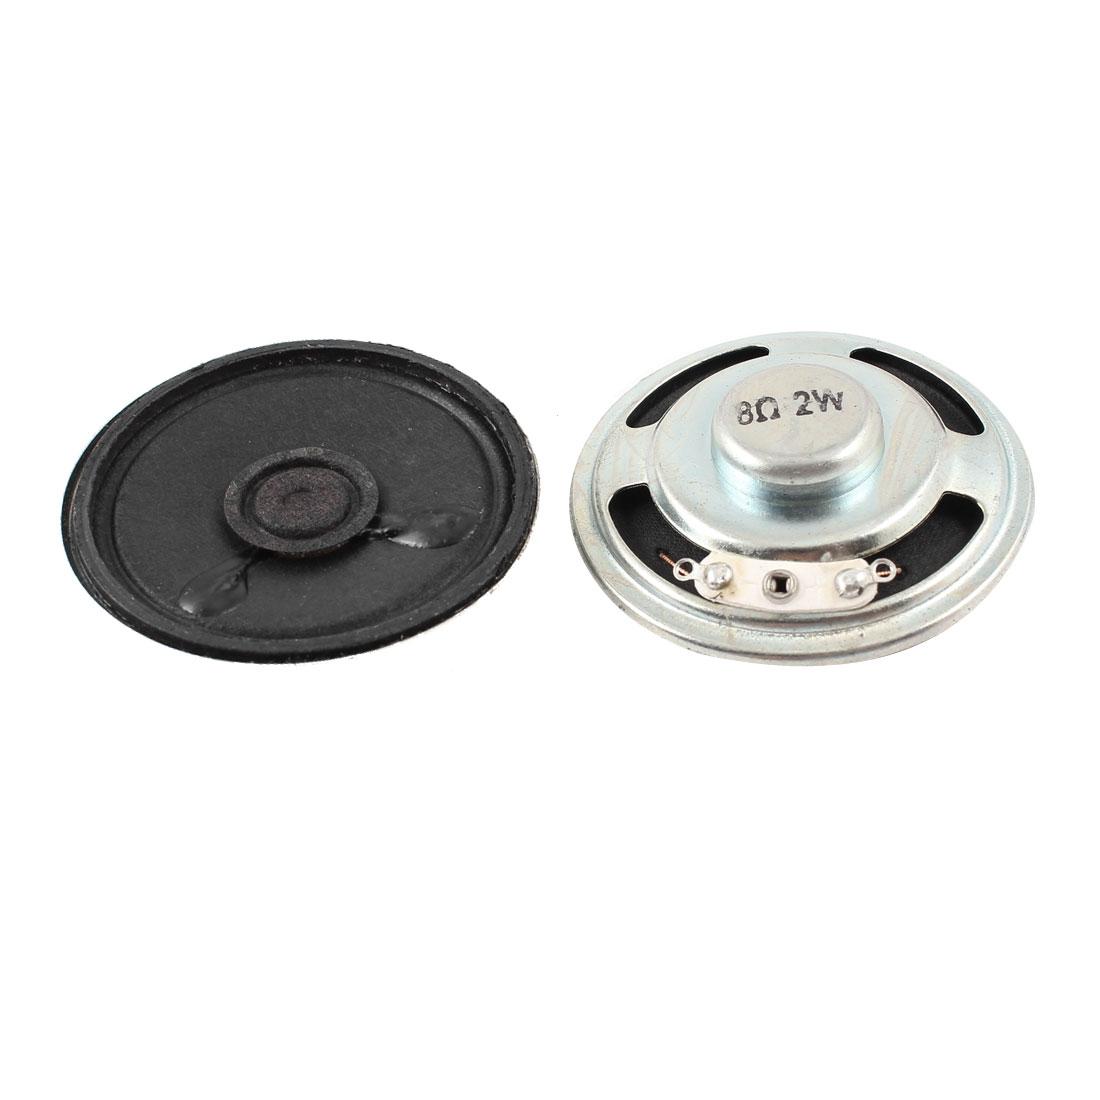 2 Pcs 2W 8 Ohm 50mm Dia Laptop Metal Housing Magnet Speaker Amplifier Loudspeaker